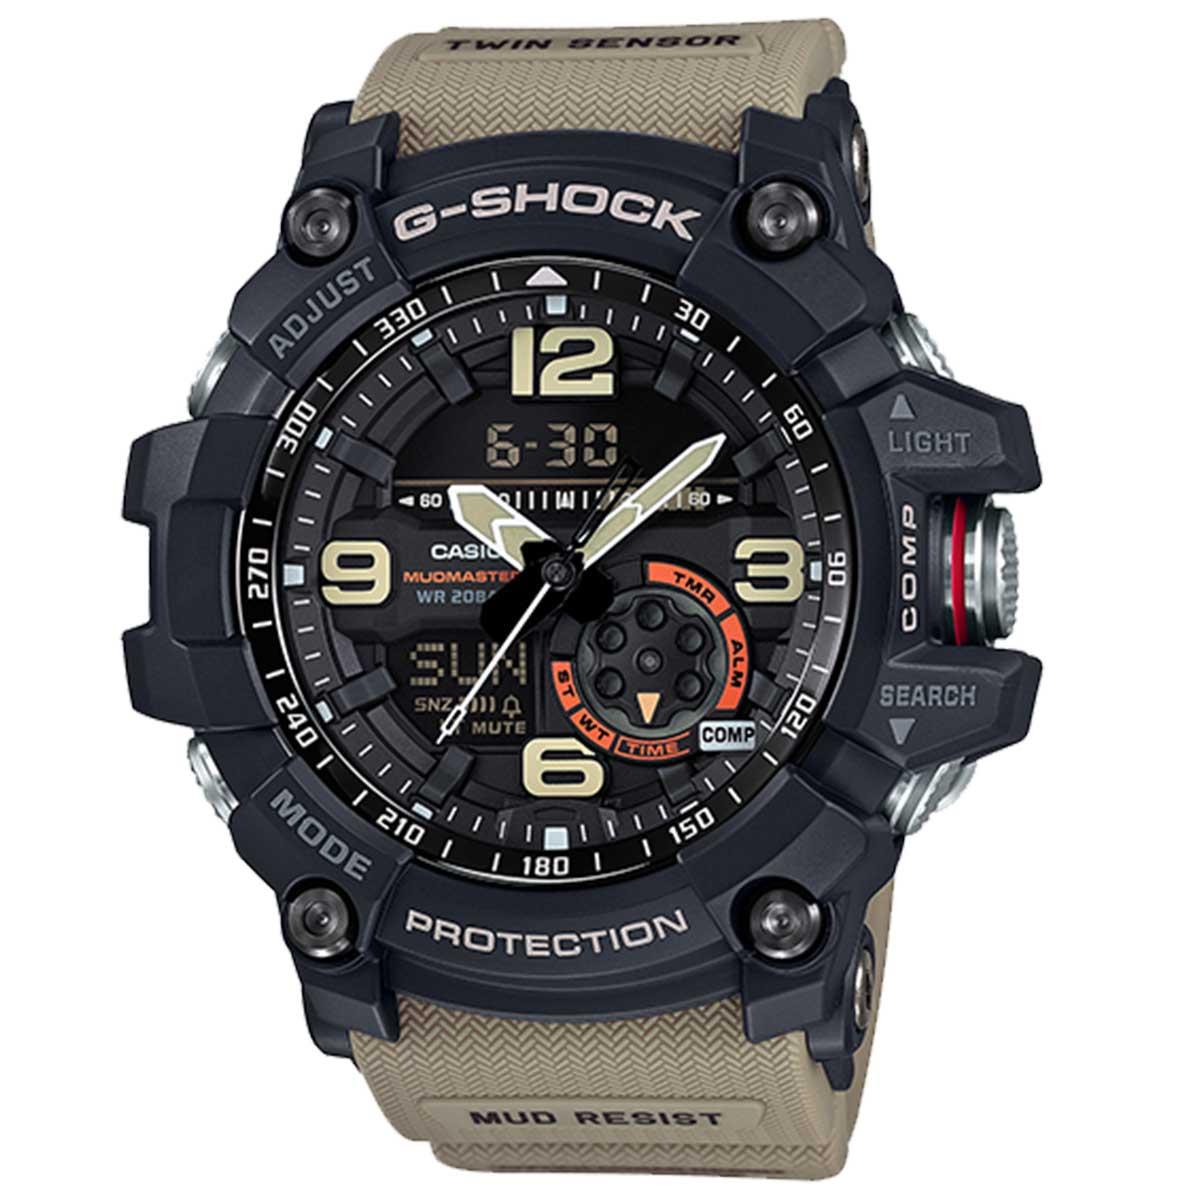 Relógio de Pulso Casio G-ShocK GG-1000-1A5DR